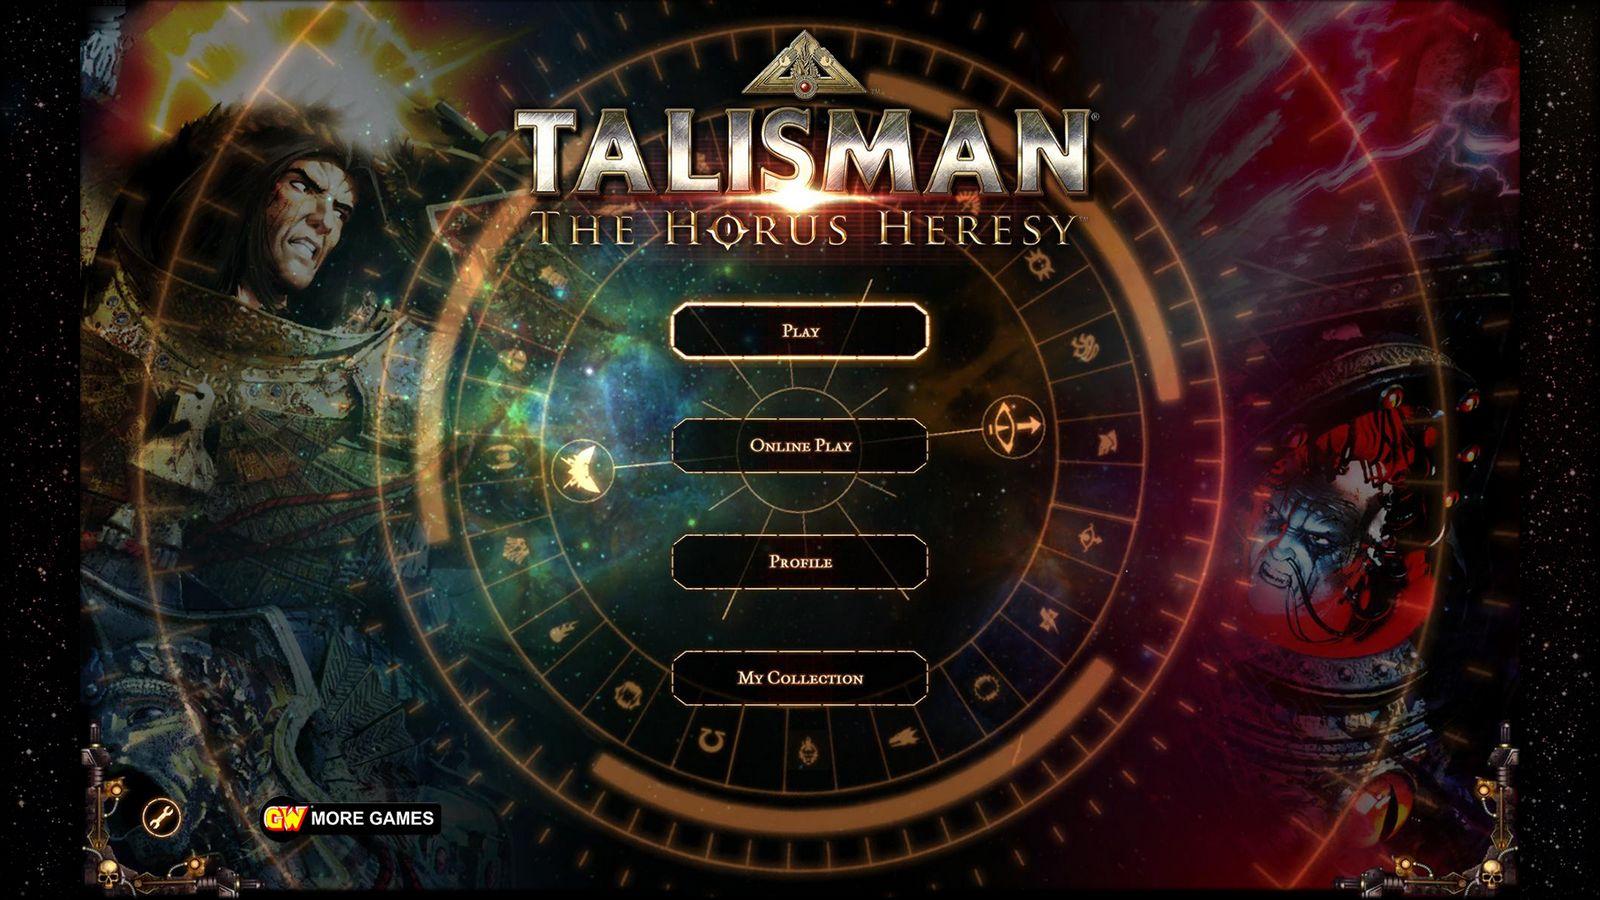 Talisman: The Horus Heresy 2016 pc game Img-1